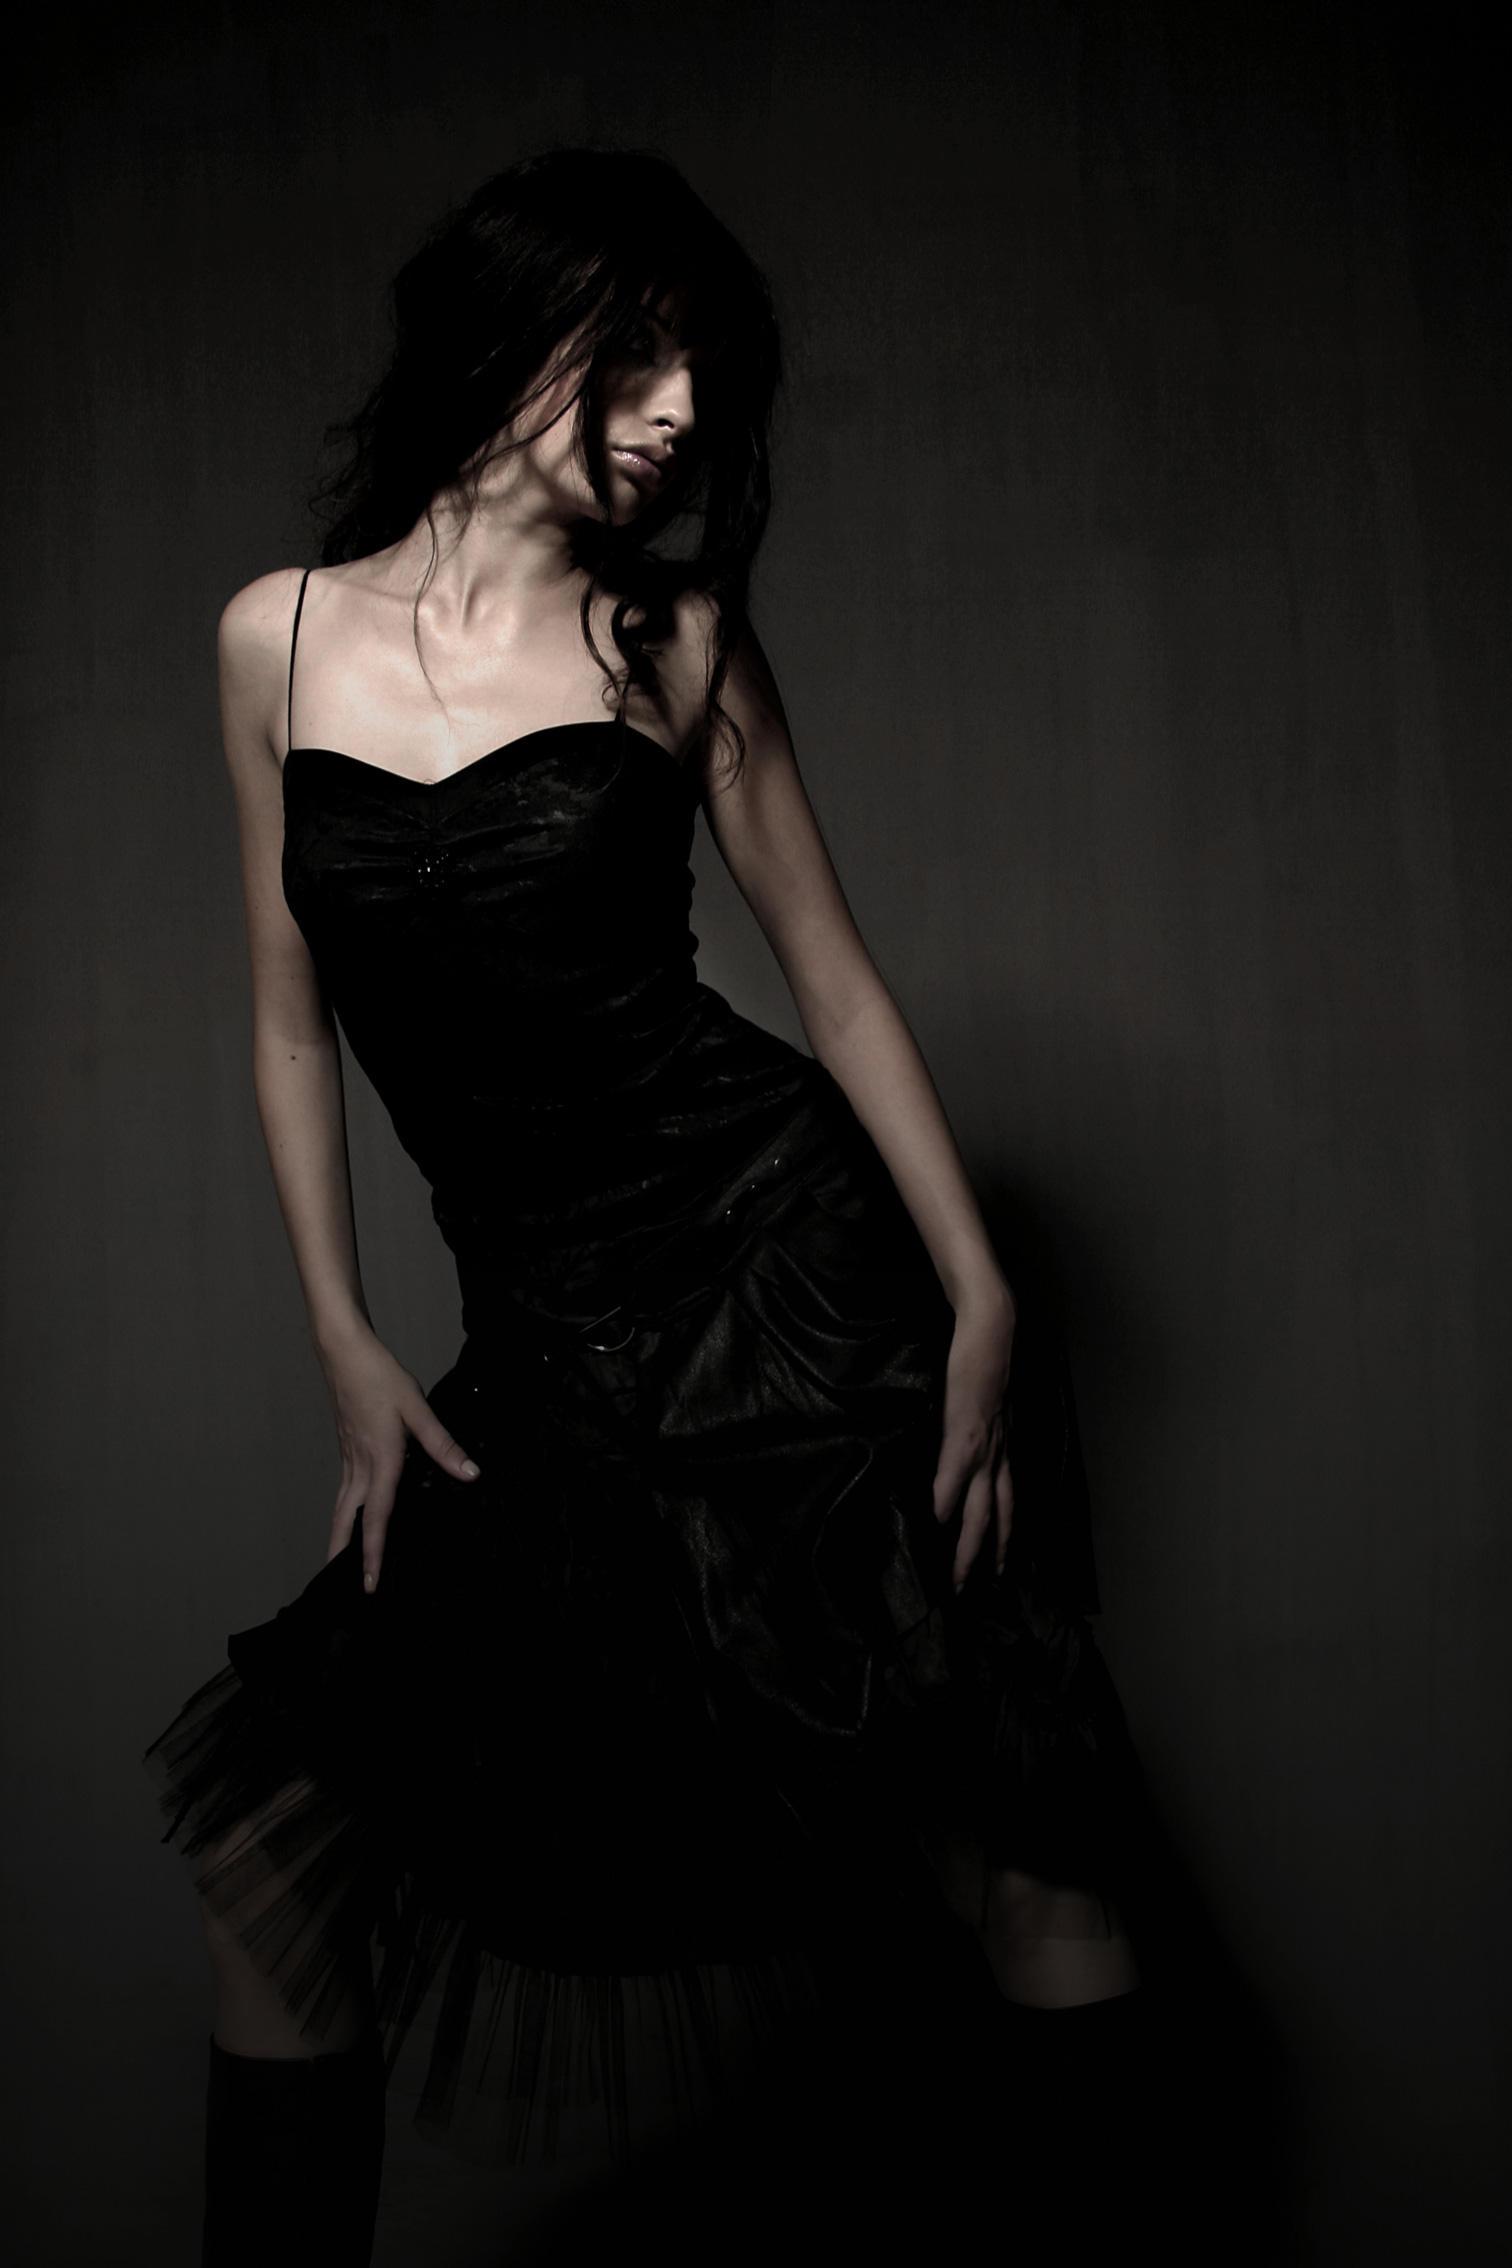 black in plastic by loveisaplasticshield